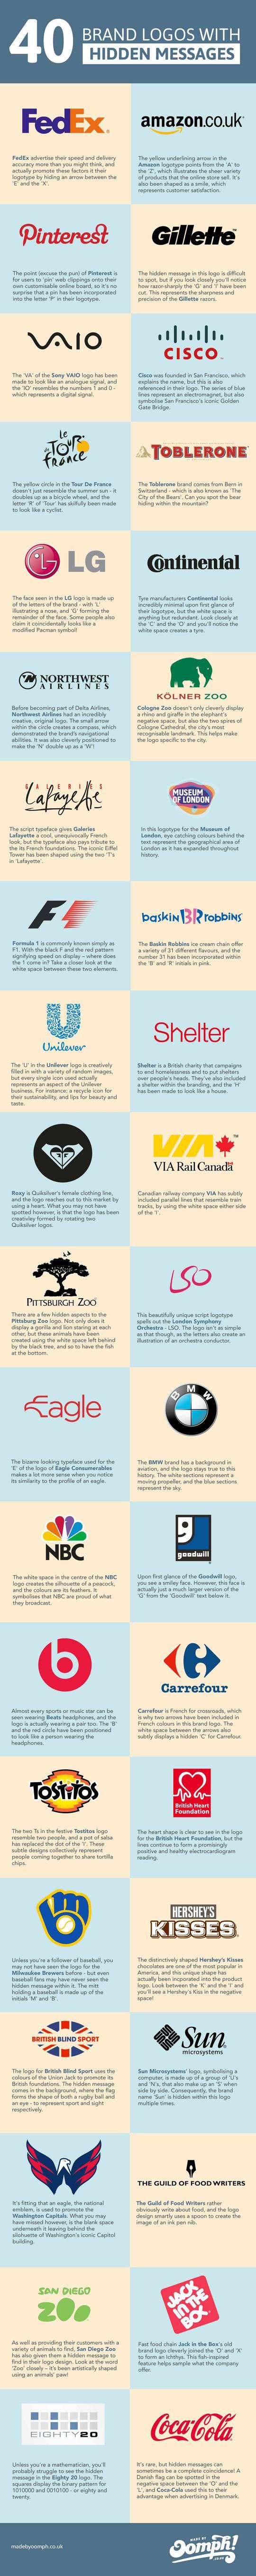 40 logos de marcas con mensajes ocultos